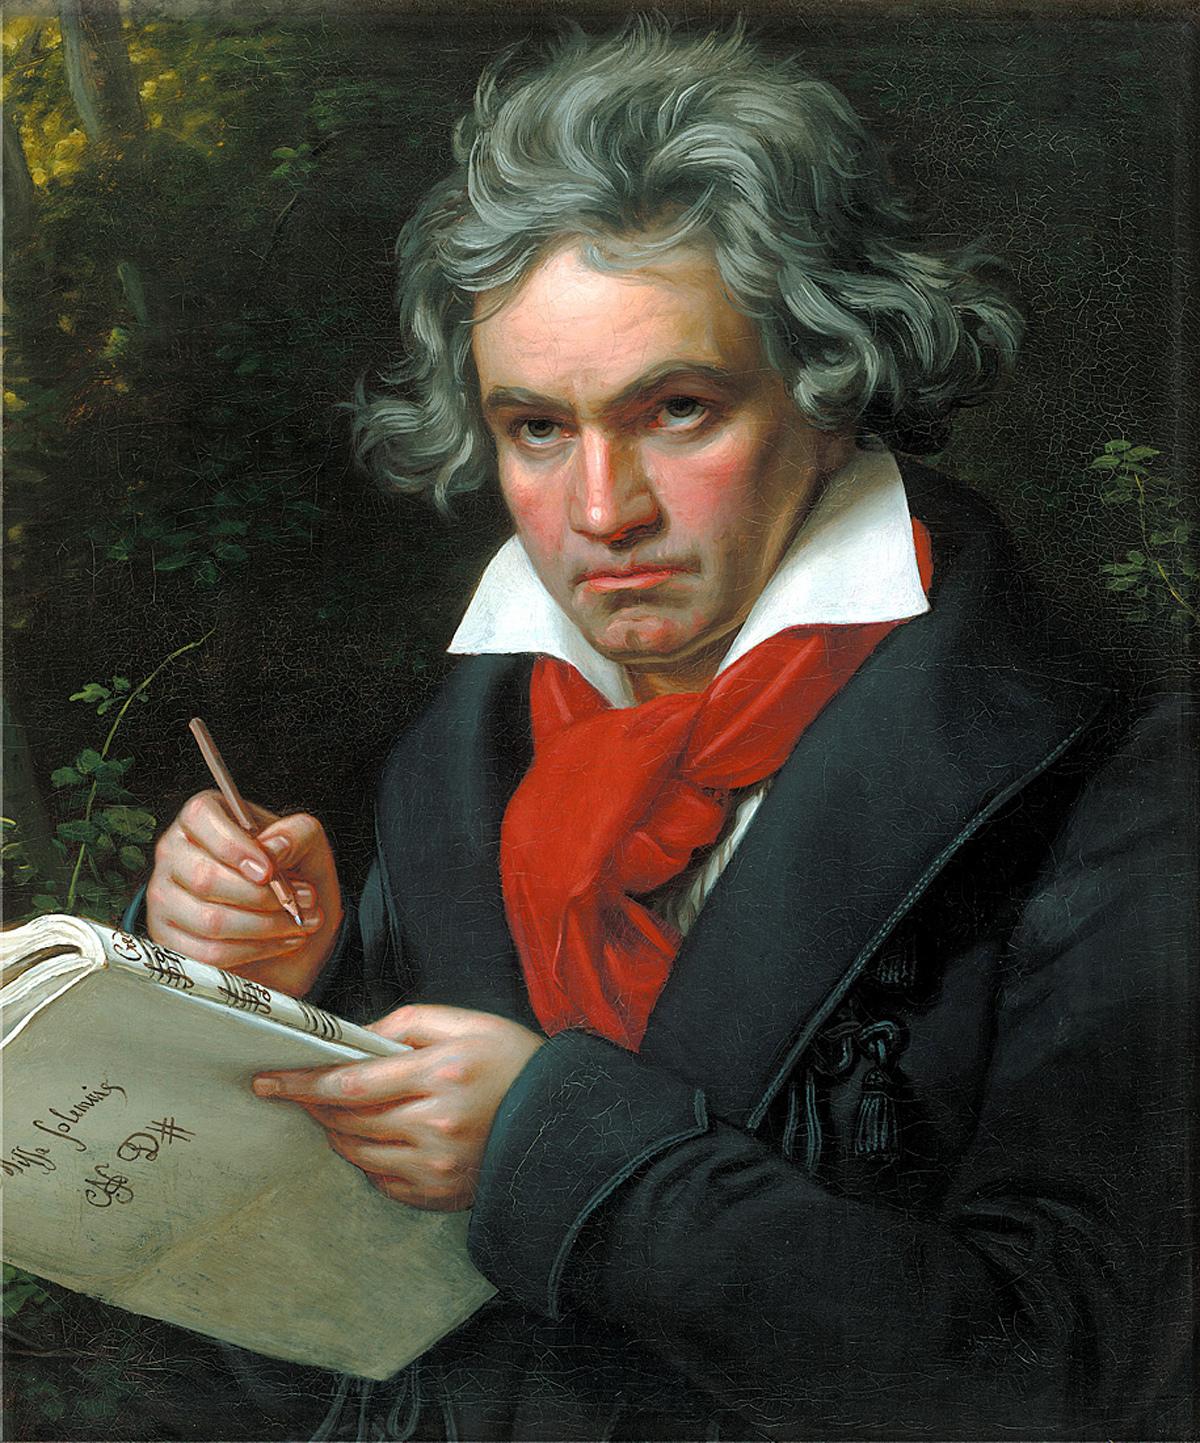 Ludwig van Beethoven music composer